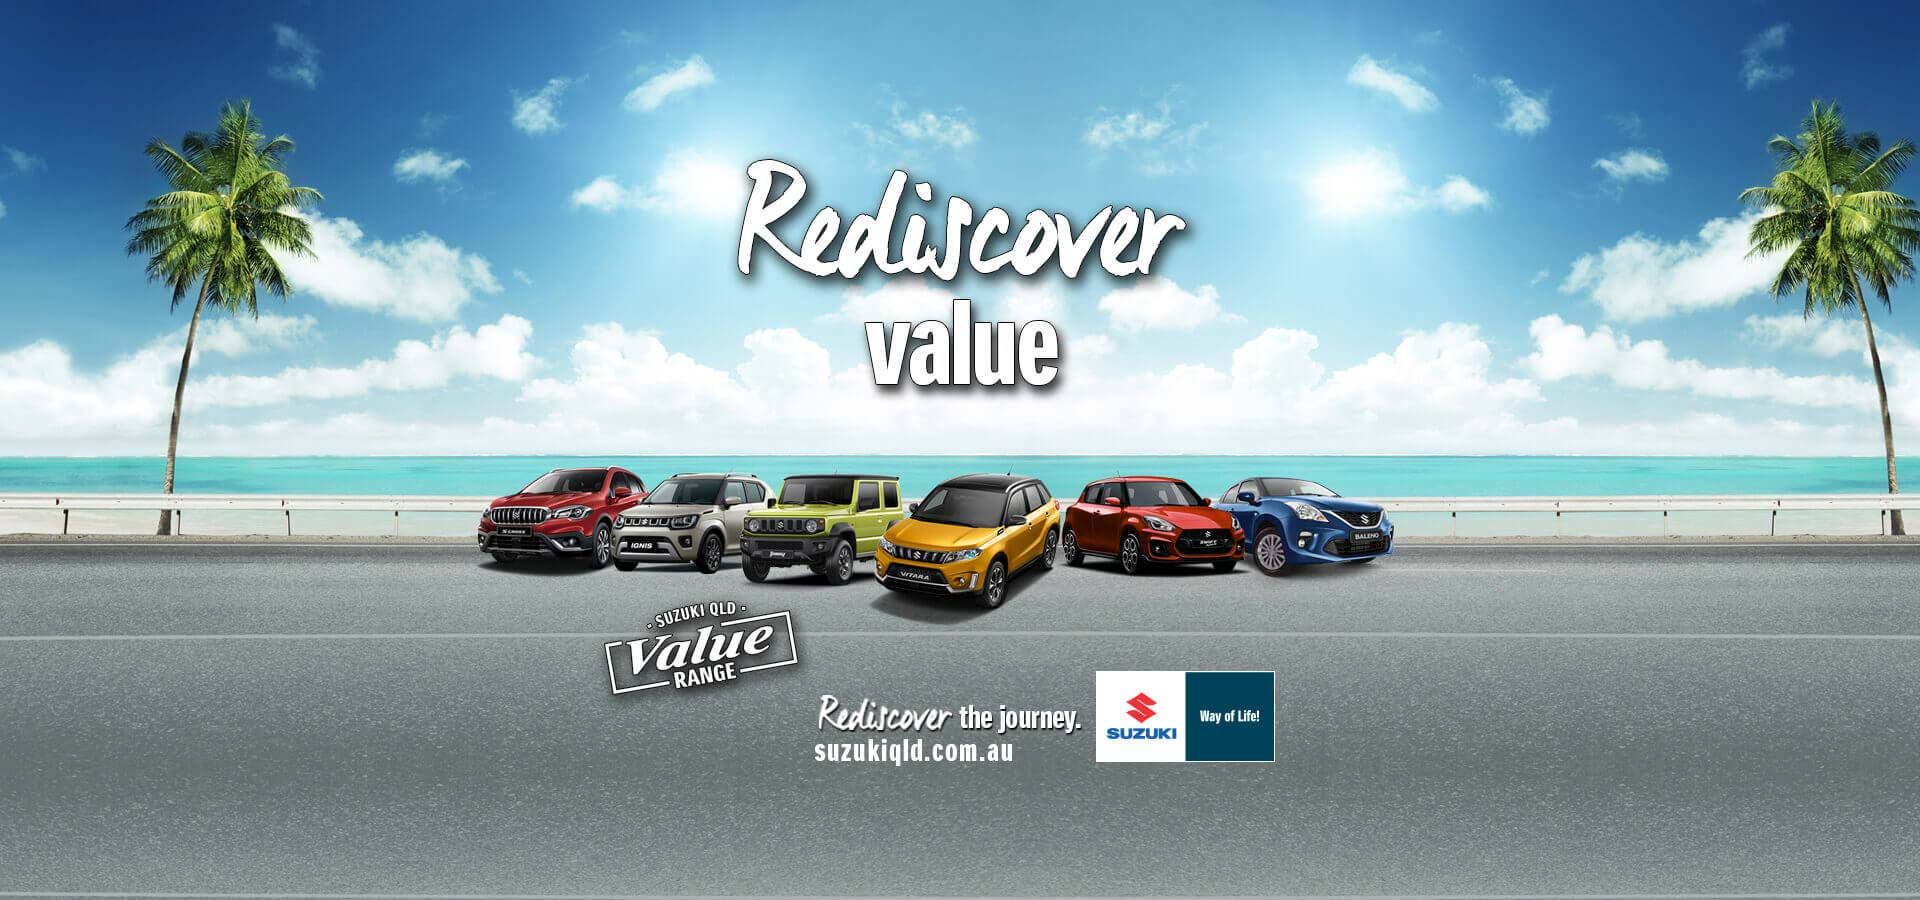 Suzuki QLD Rediscover Value